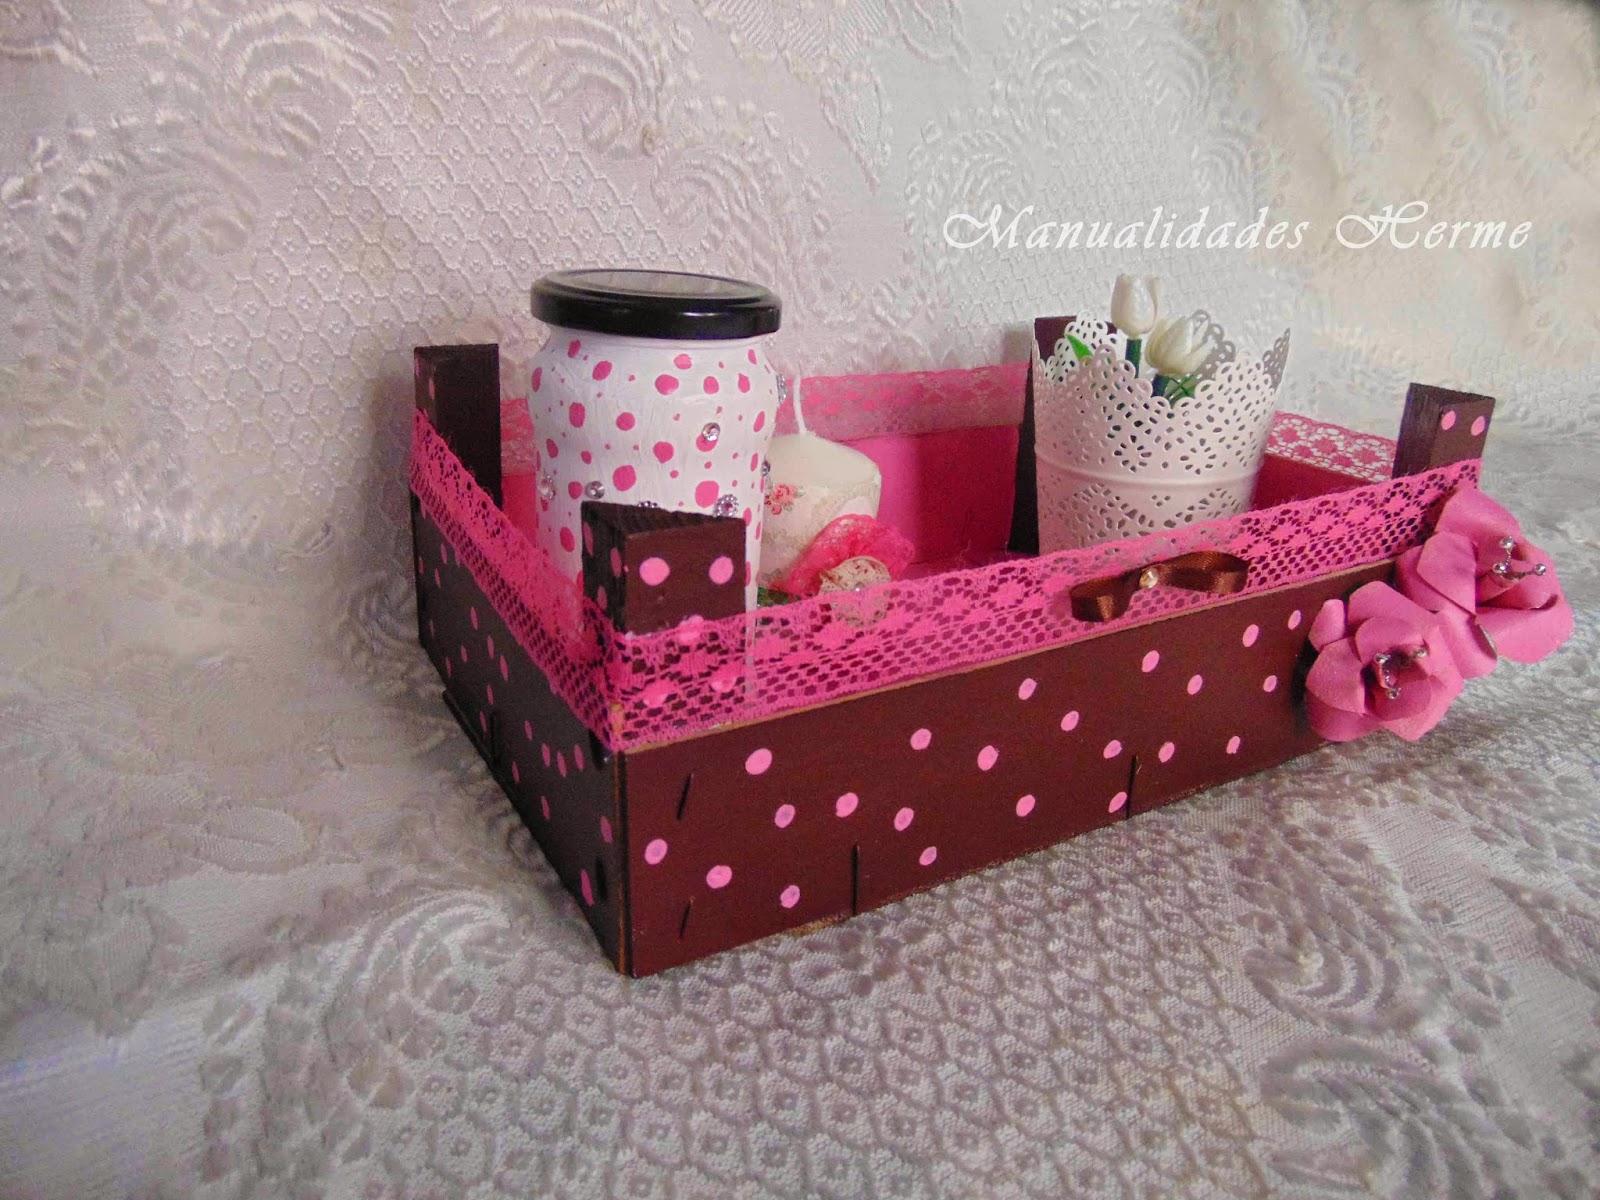 Manualidades herme diy caja de fruta decorada - Caja fruta decoracion ...